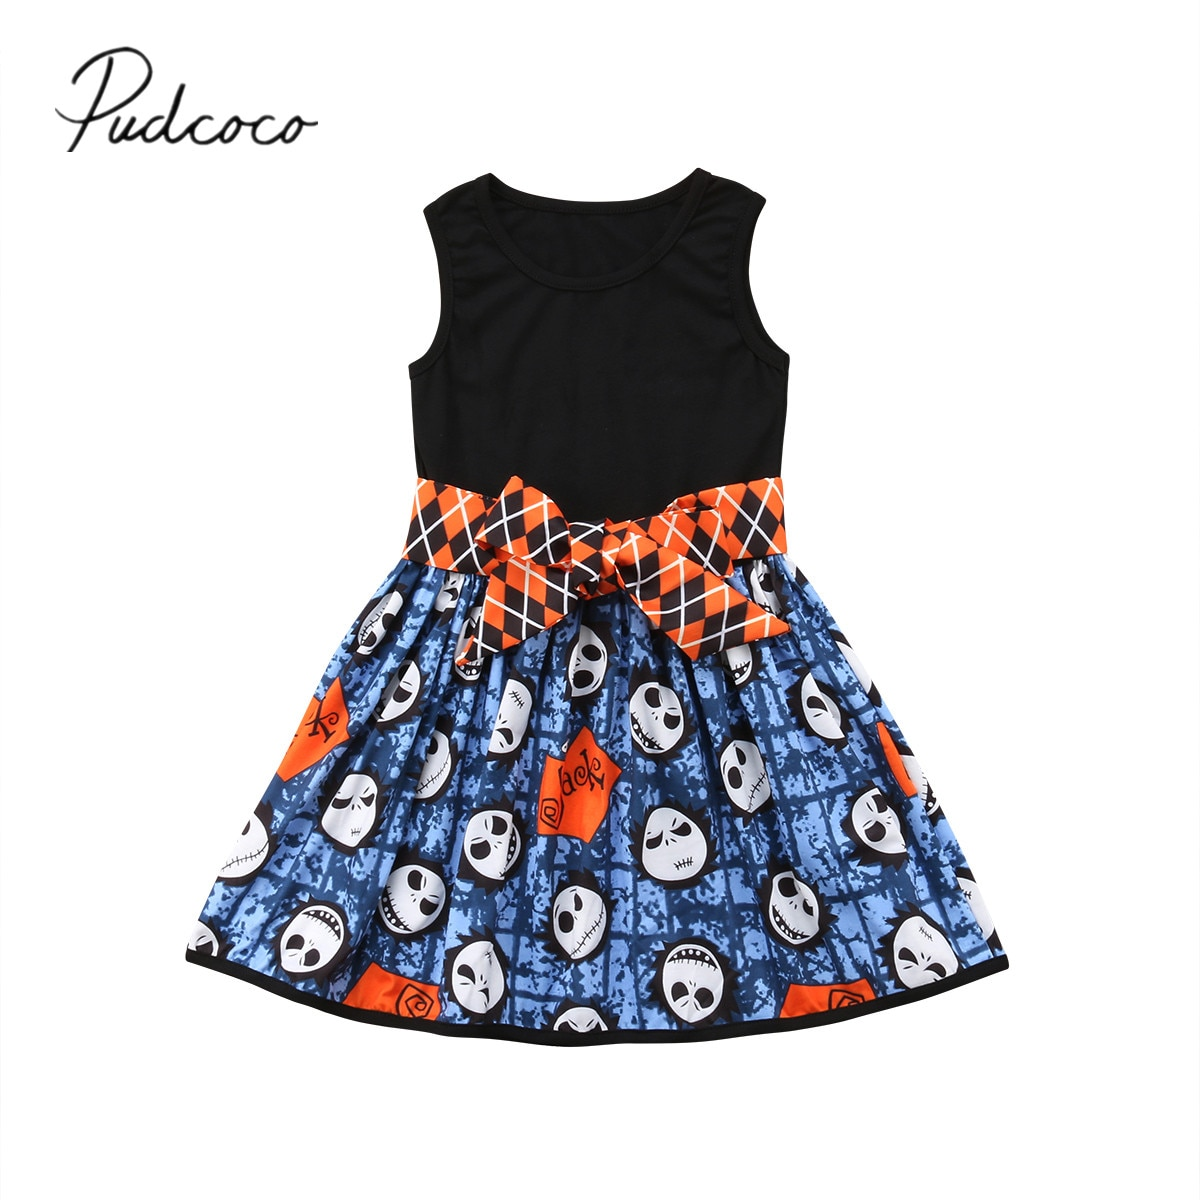 2018 Brand New Halloween Party Princess 0-5Y Toddler Kids Baby Girls Dress Sleeveless Cartoon Skulls Patchwork Knee-Length Dress